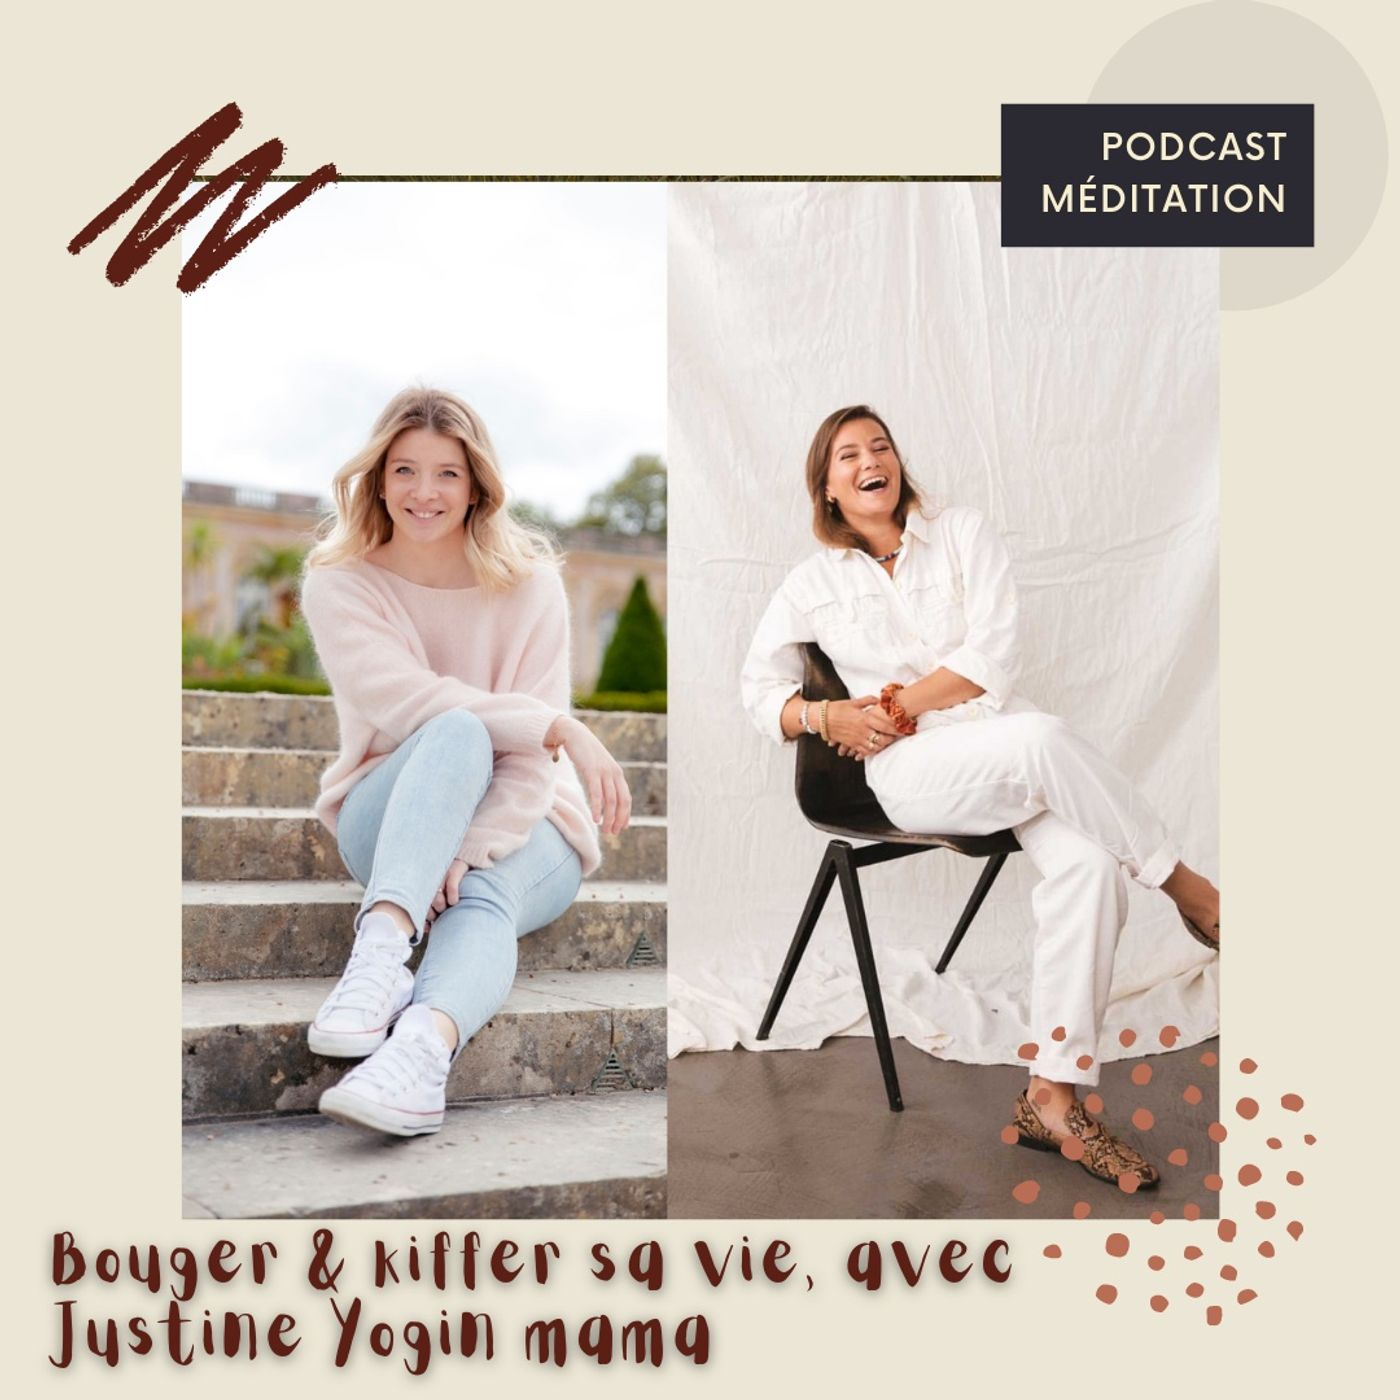 Bouger & Kiffer sa vie avec Yogin mama